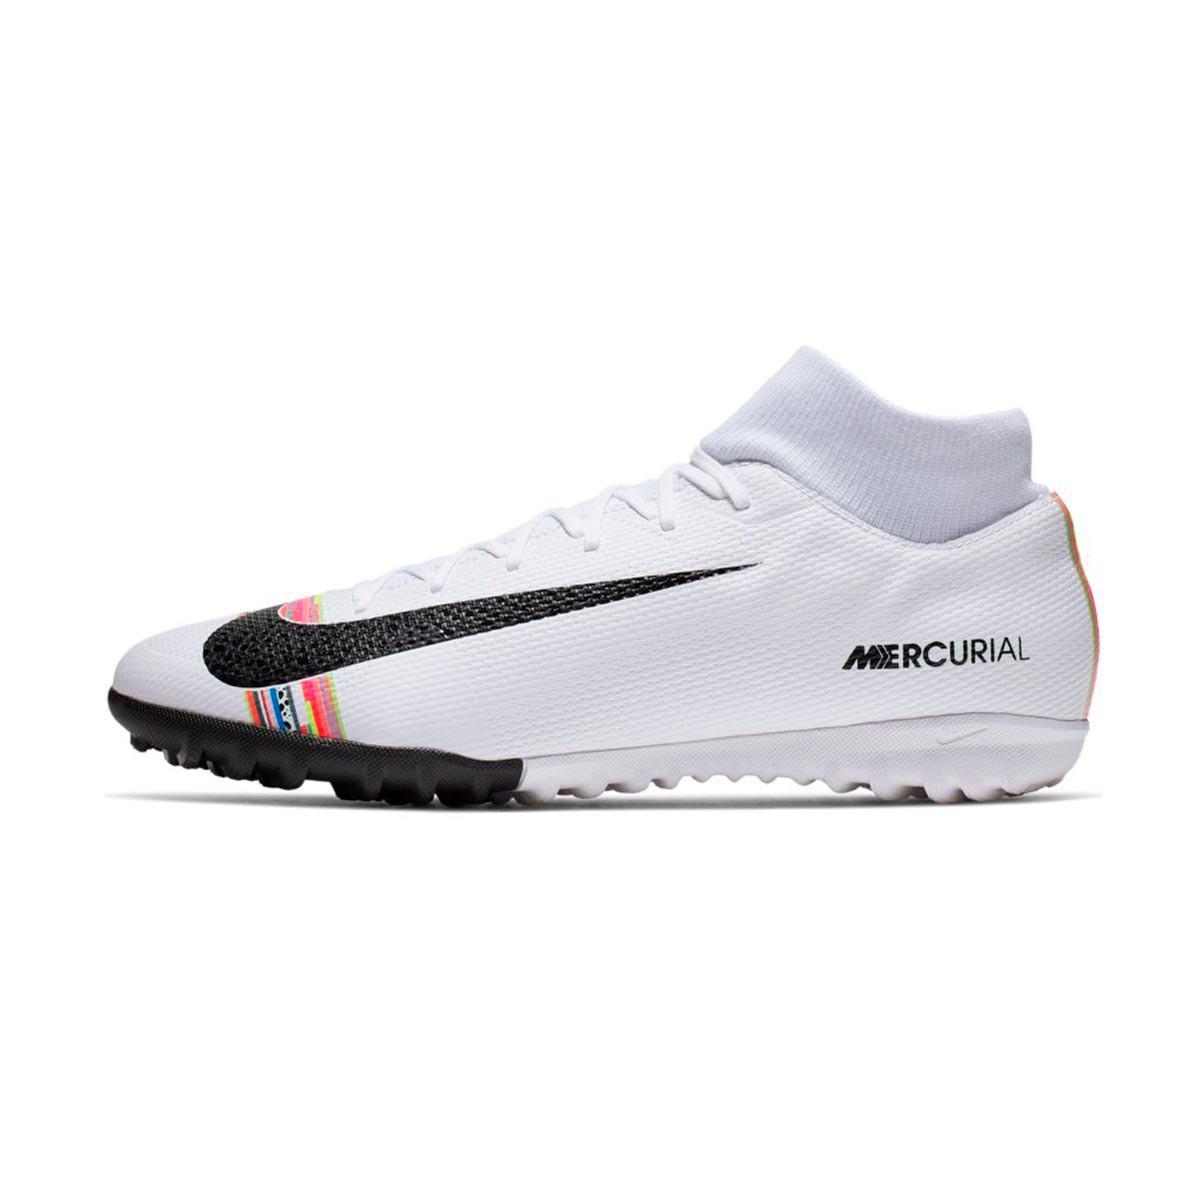 d91d22306 Football Boot Nike Mercurial SuperflyX VI Academy LVL UP Turf White-Black- Pure platinum - Football store Fútbol Emotion